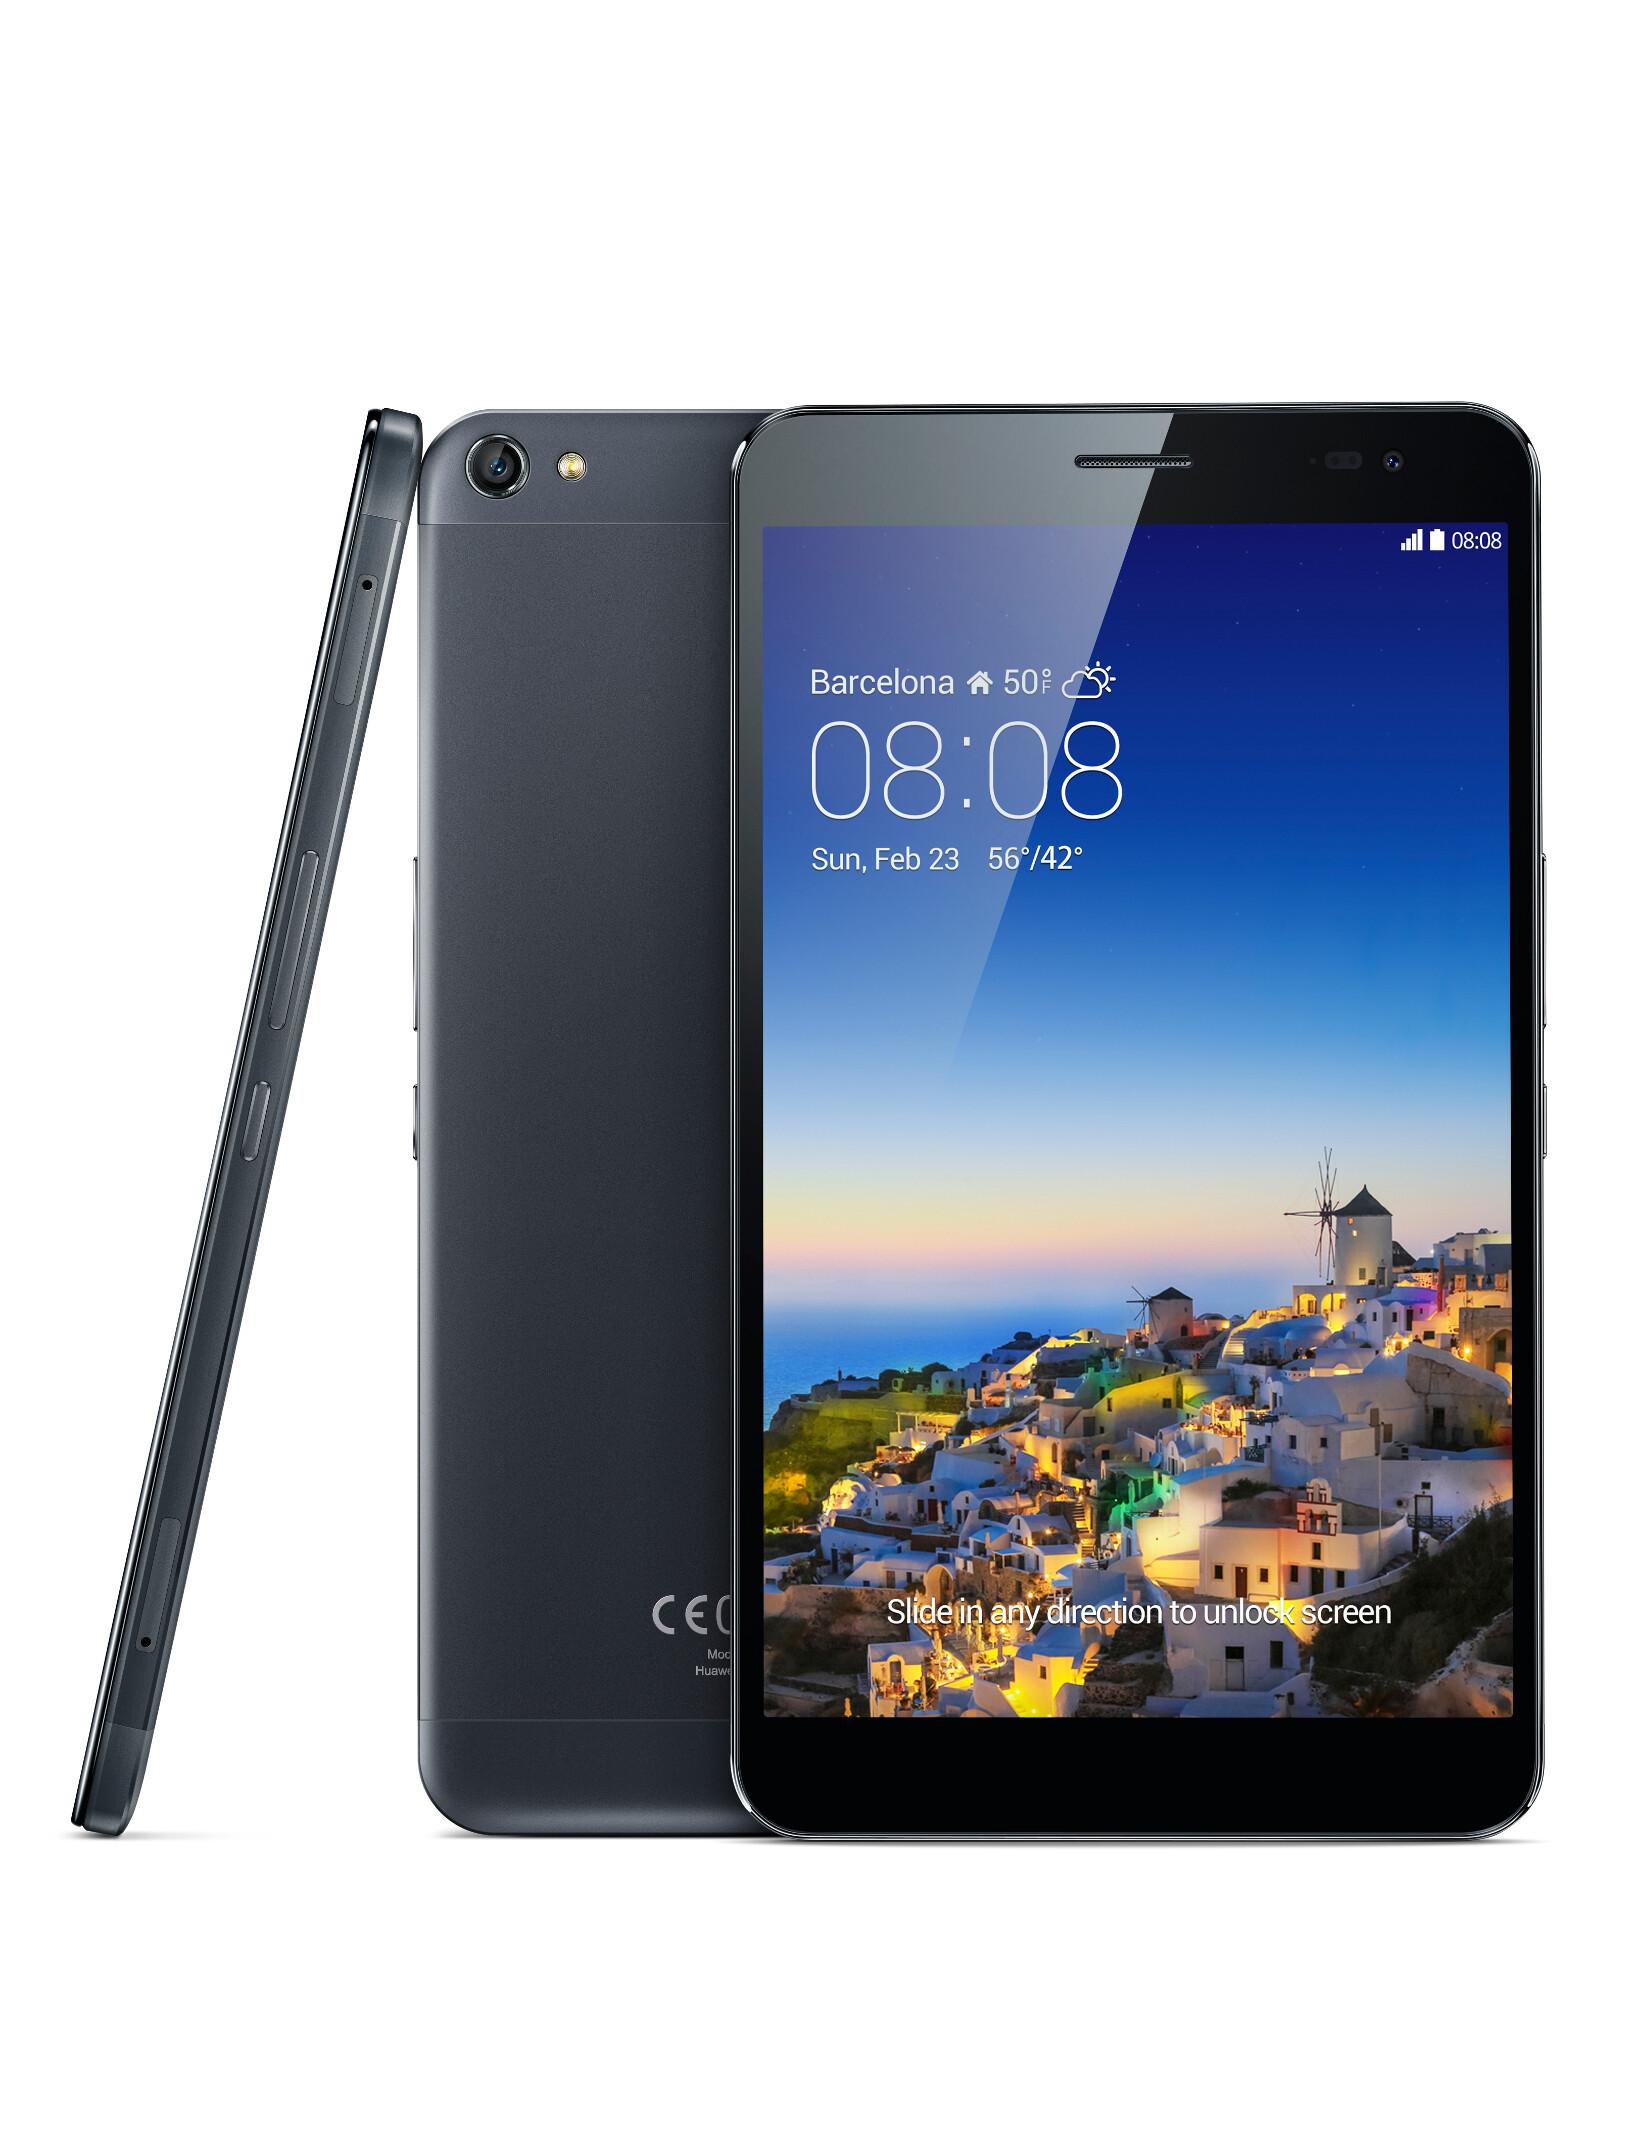 Huawei MediaPad X1 - Характеристики